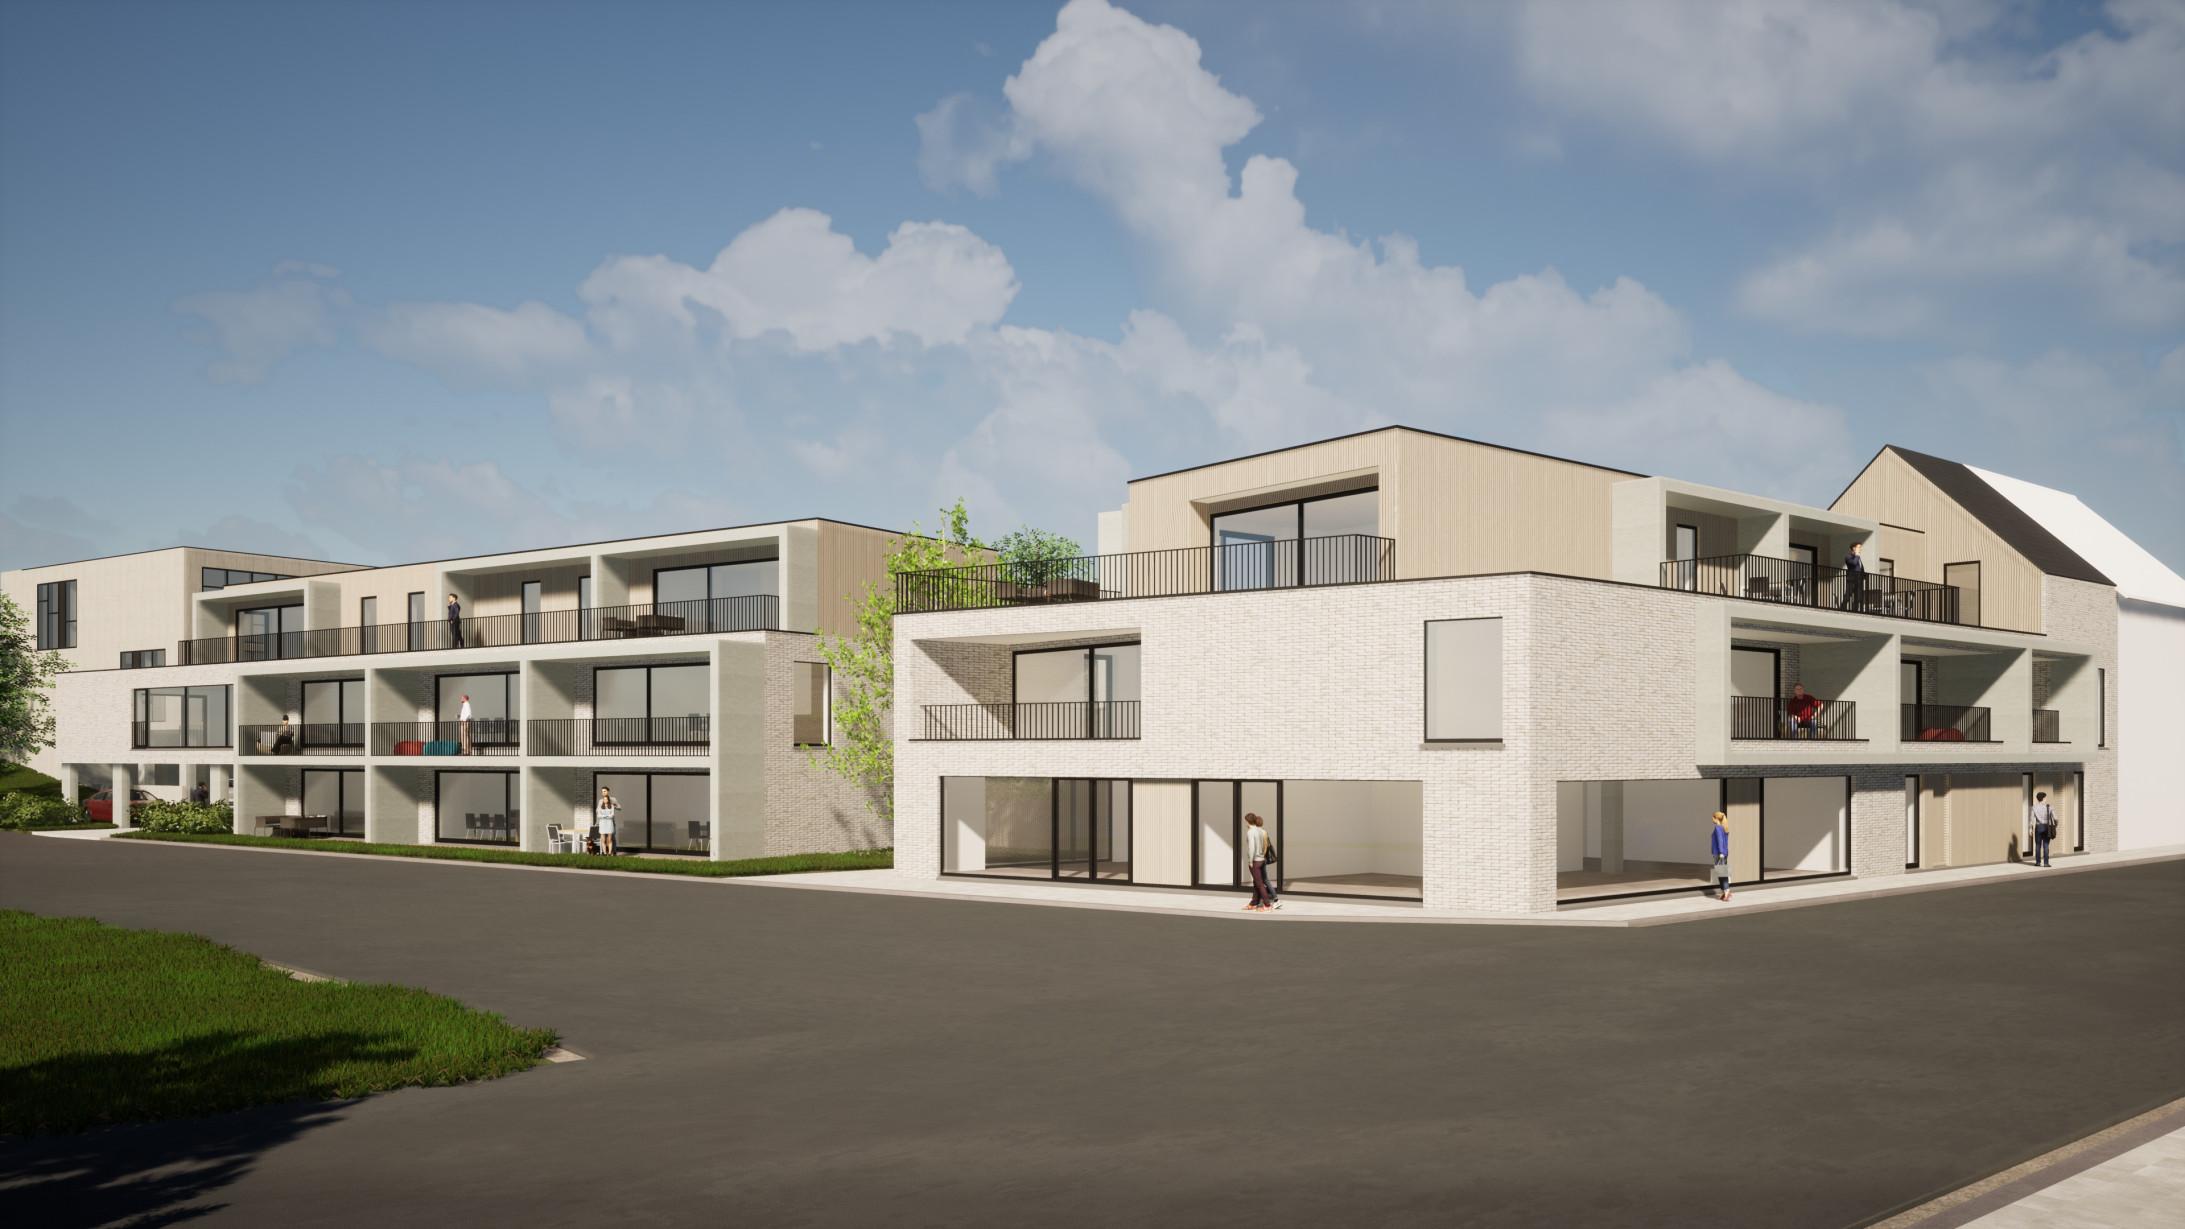 St Eloois Winkel_meergezinswoning kantoren_Claeys Architecten_10 kopie.jpg